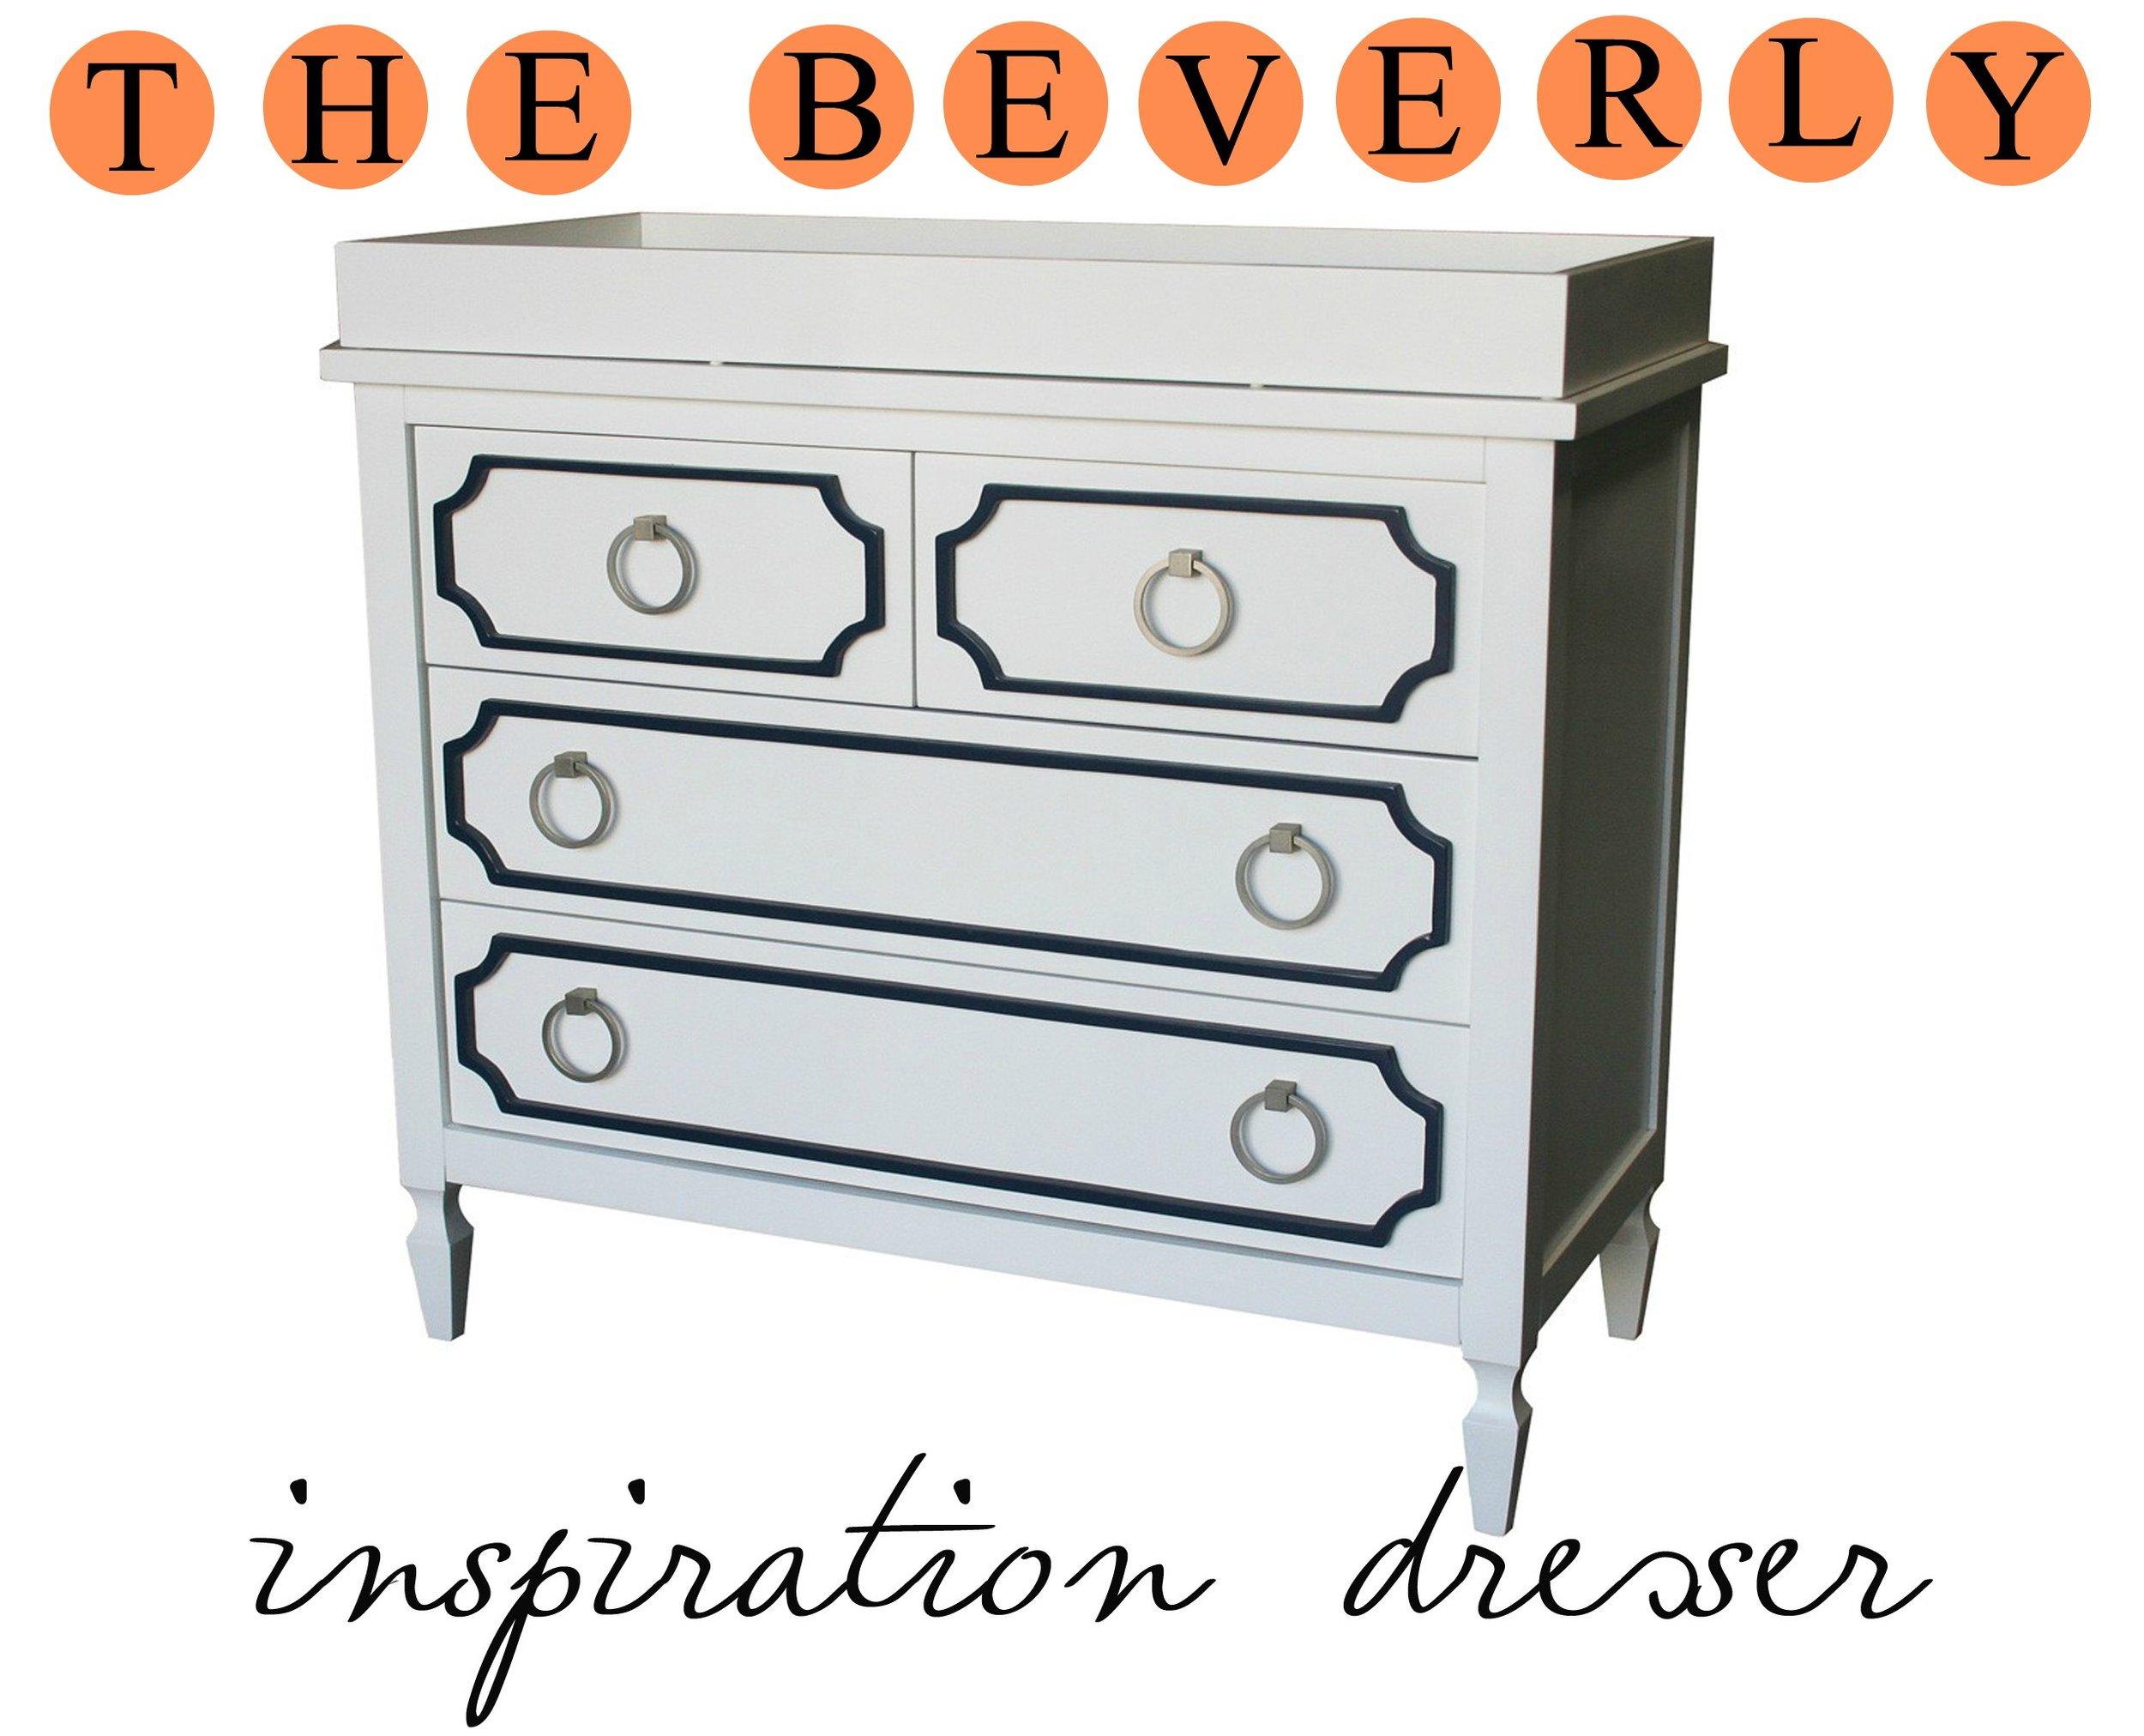 Inspiration dresser